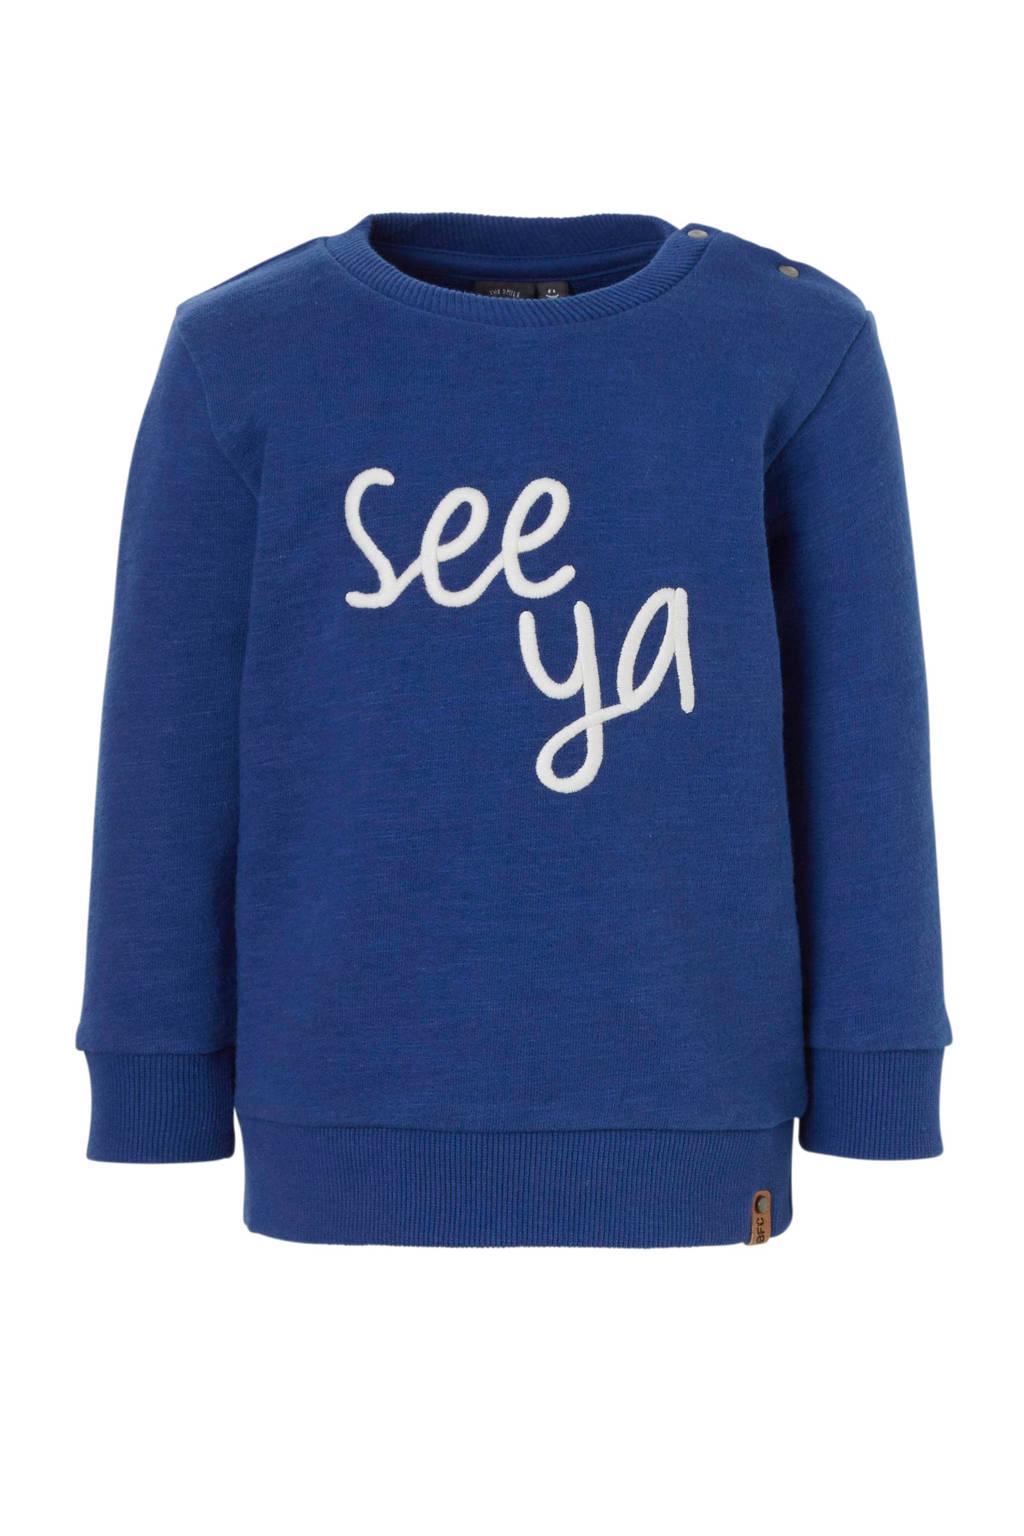 Babyface sweater met tekst kobaltblauw, Kobaltblauw